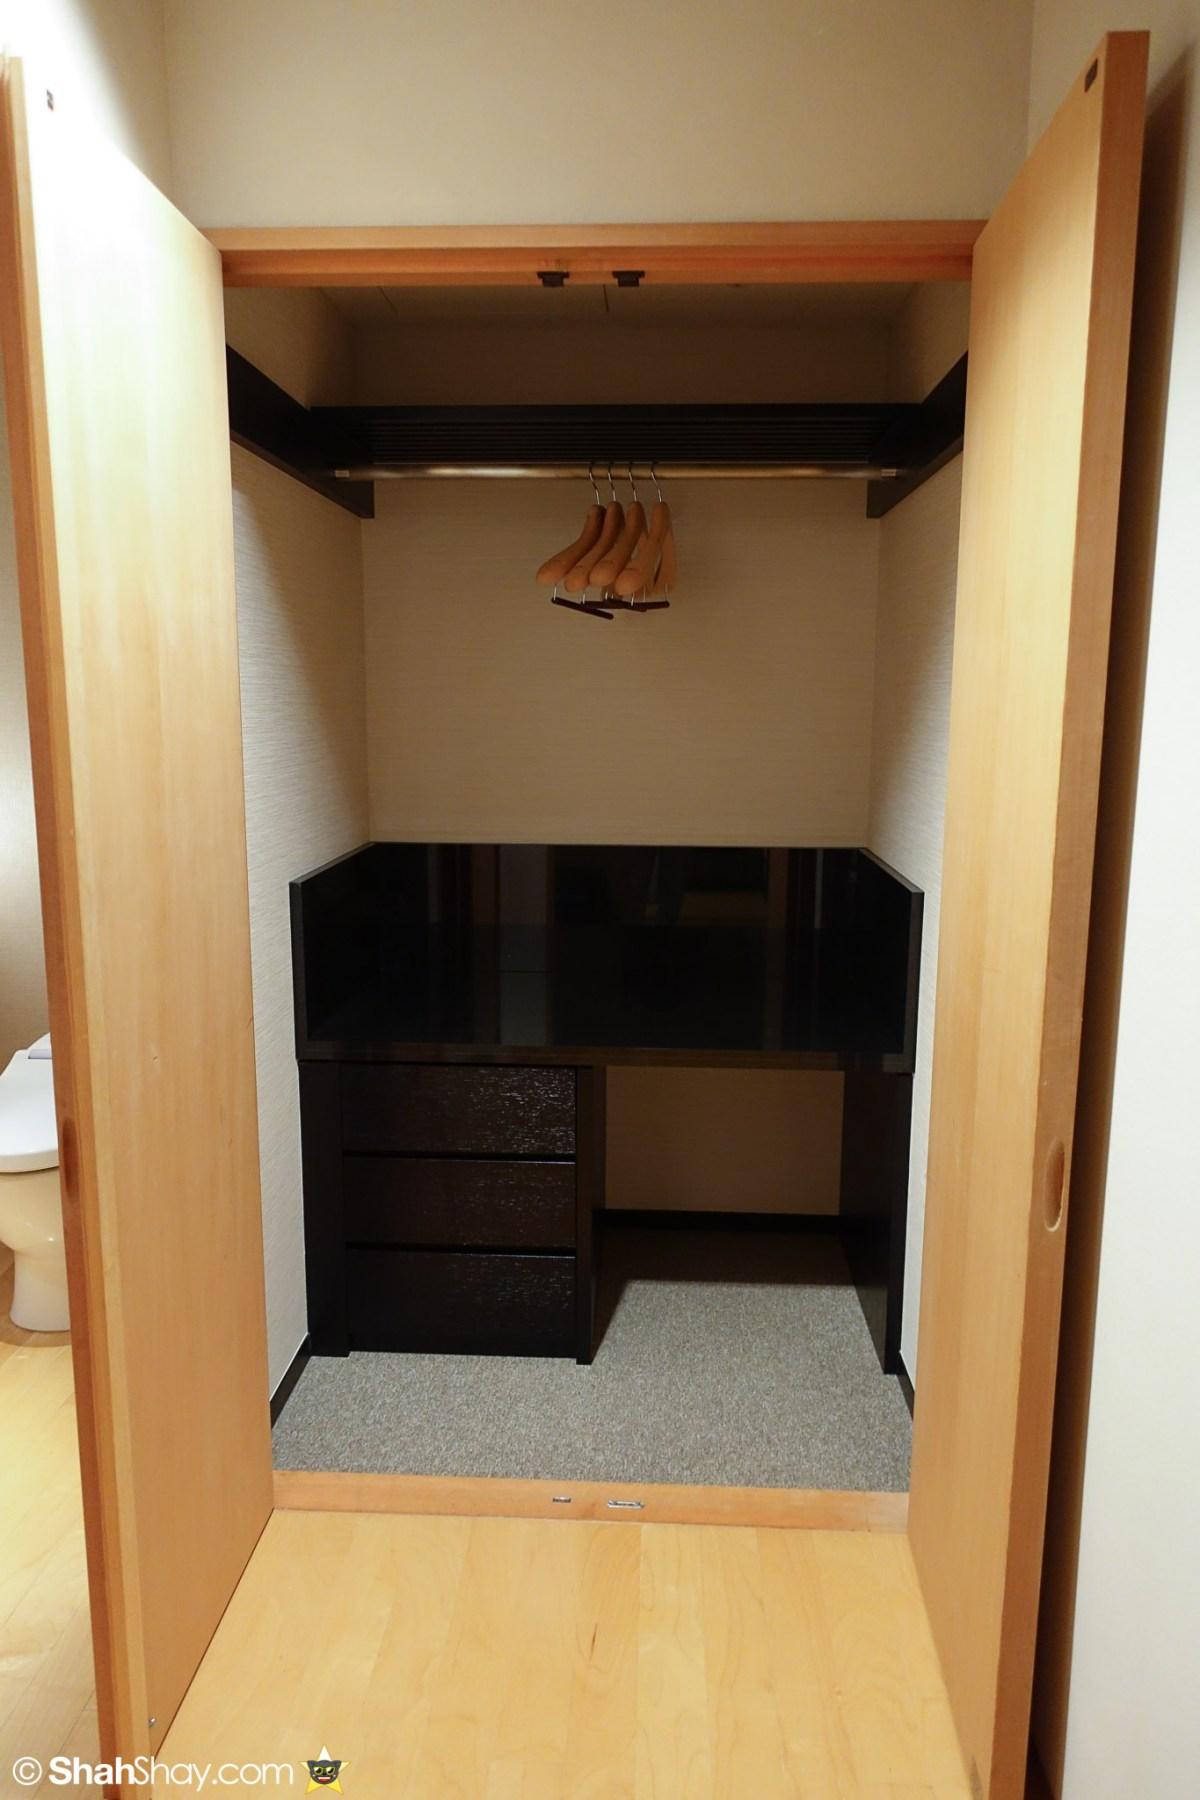 The Ritz-Carlton Tokyo Rooms - Modern Japanese Suite - Toilet Storage